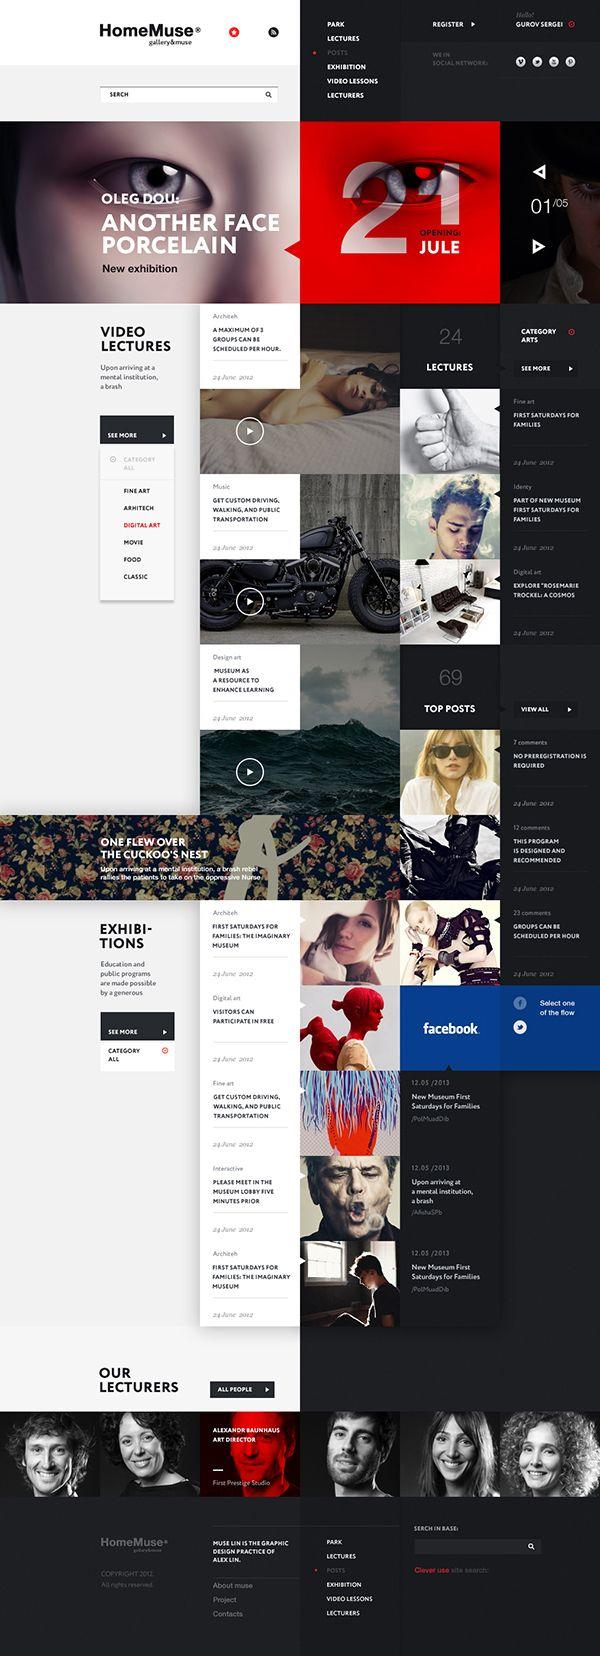 Donhkoland / Sky   #webdesign #it #web #design #layout #userinterface #website #webdesign <<< repinned by an #advertising #agency from #Hamburg / #Germany - www.BlickeDeeler.de   Follow us on www.facebook.com/BlickeDeeler